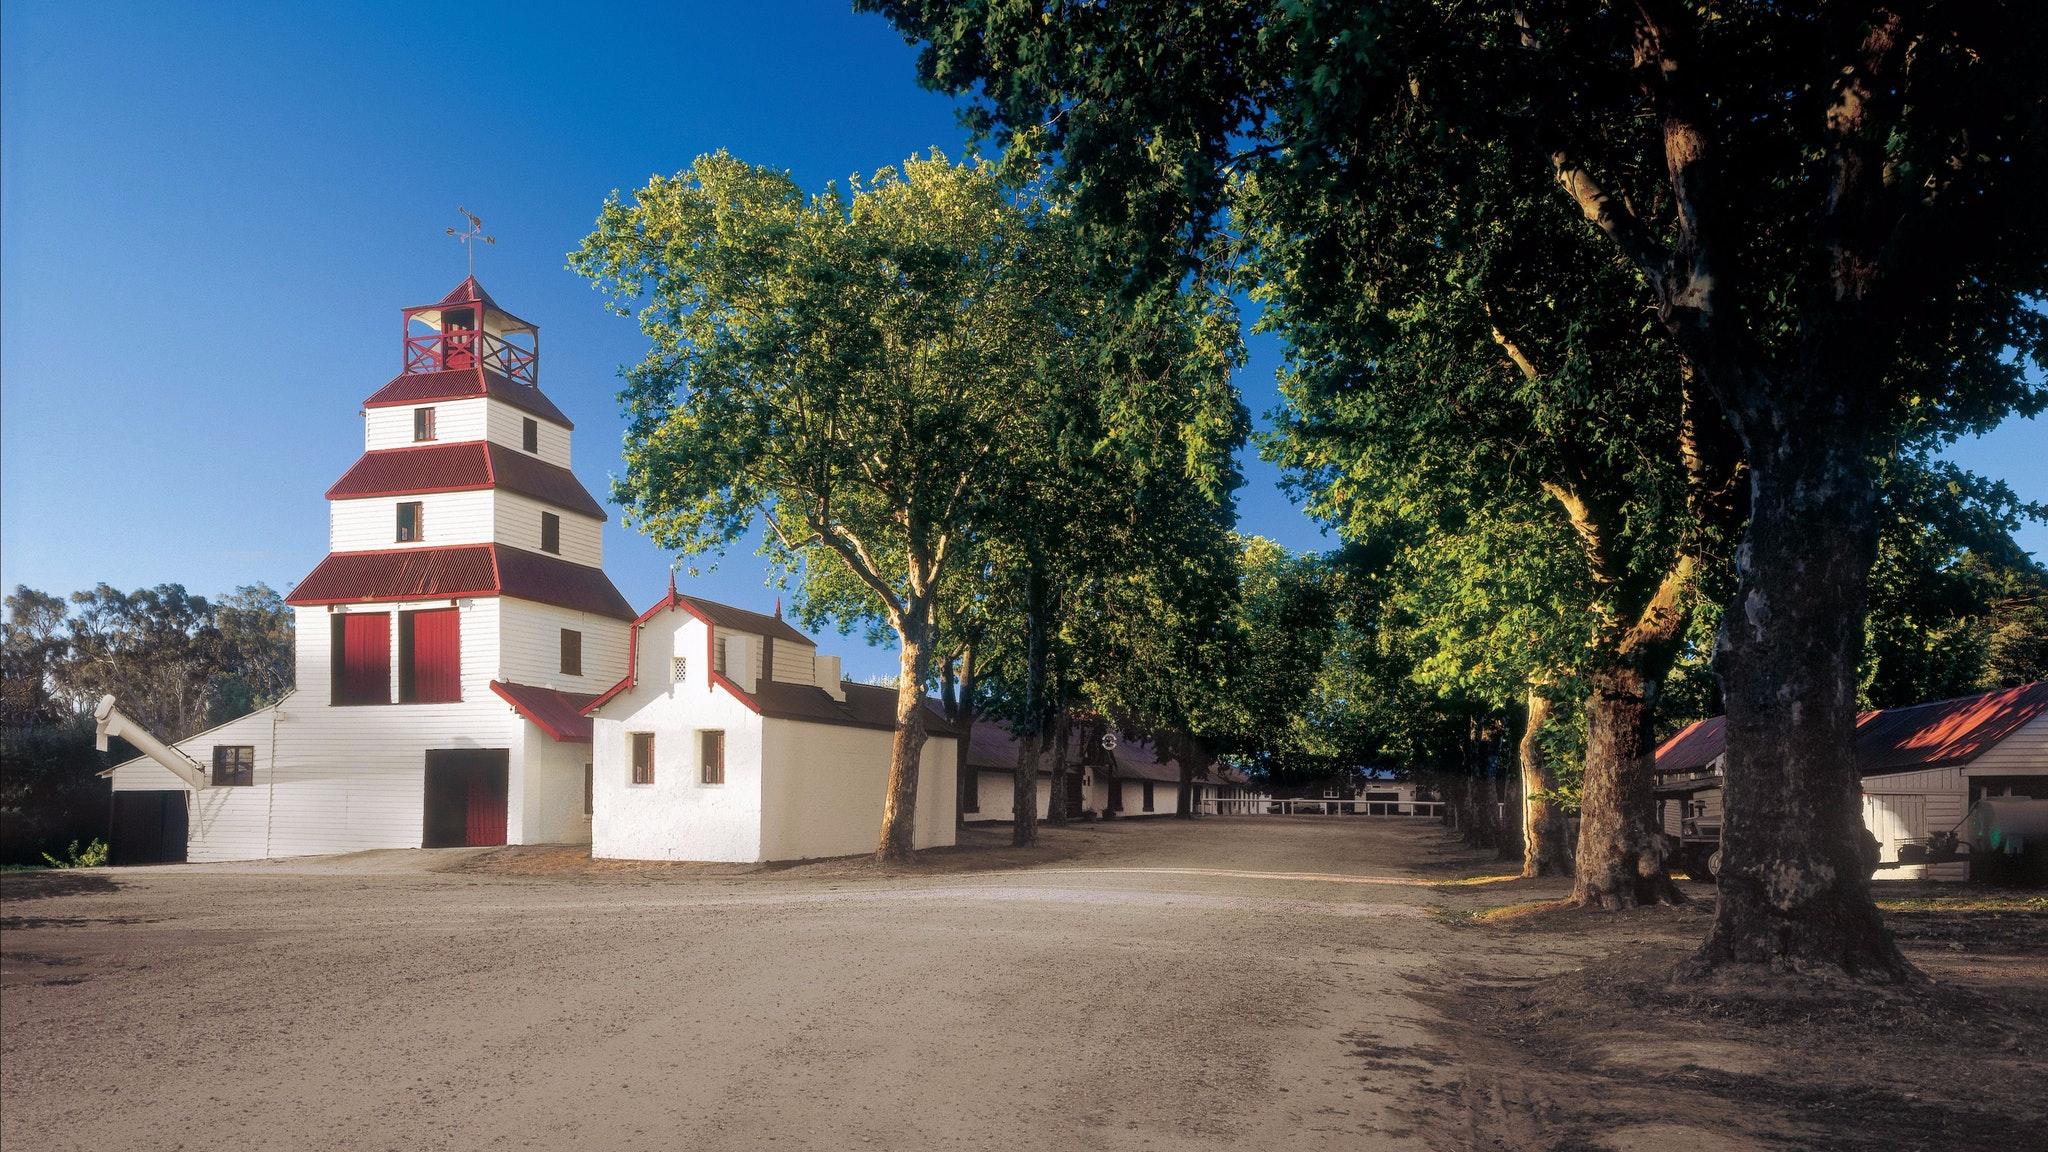 View of original Winery building & Cellar Yard